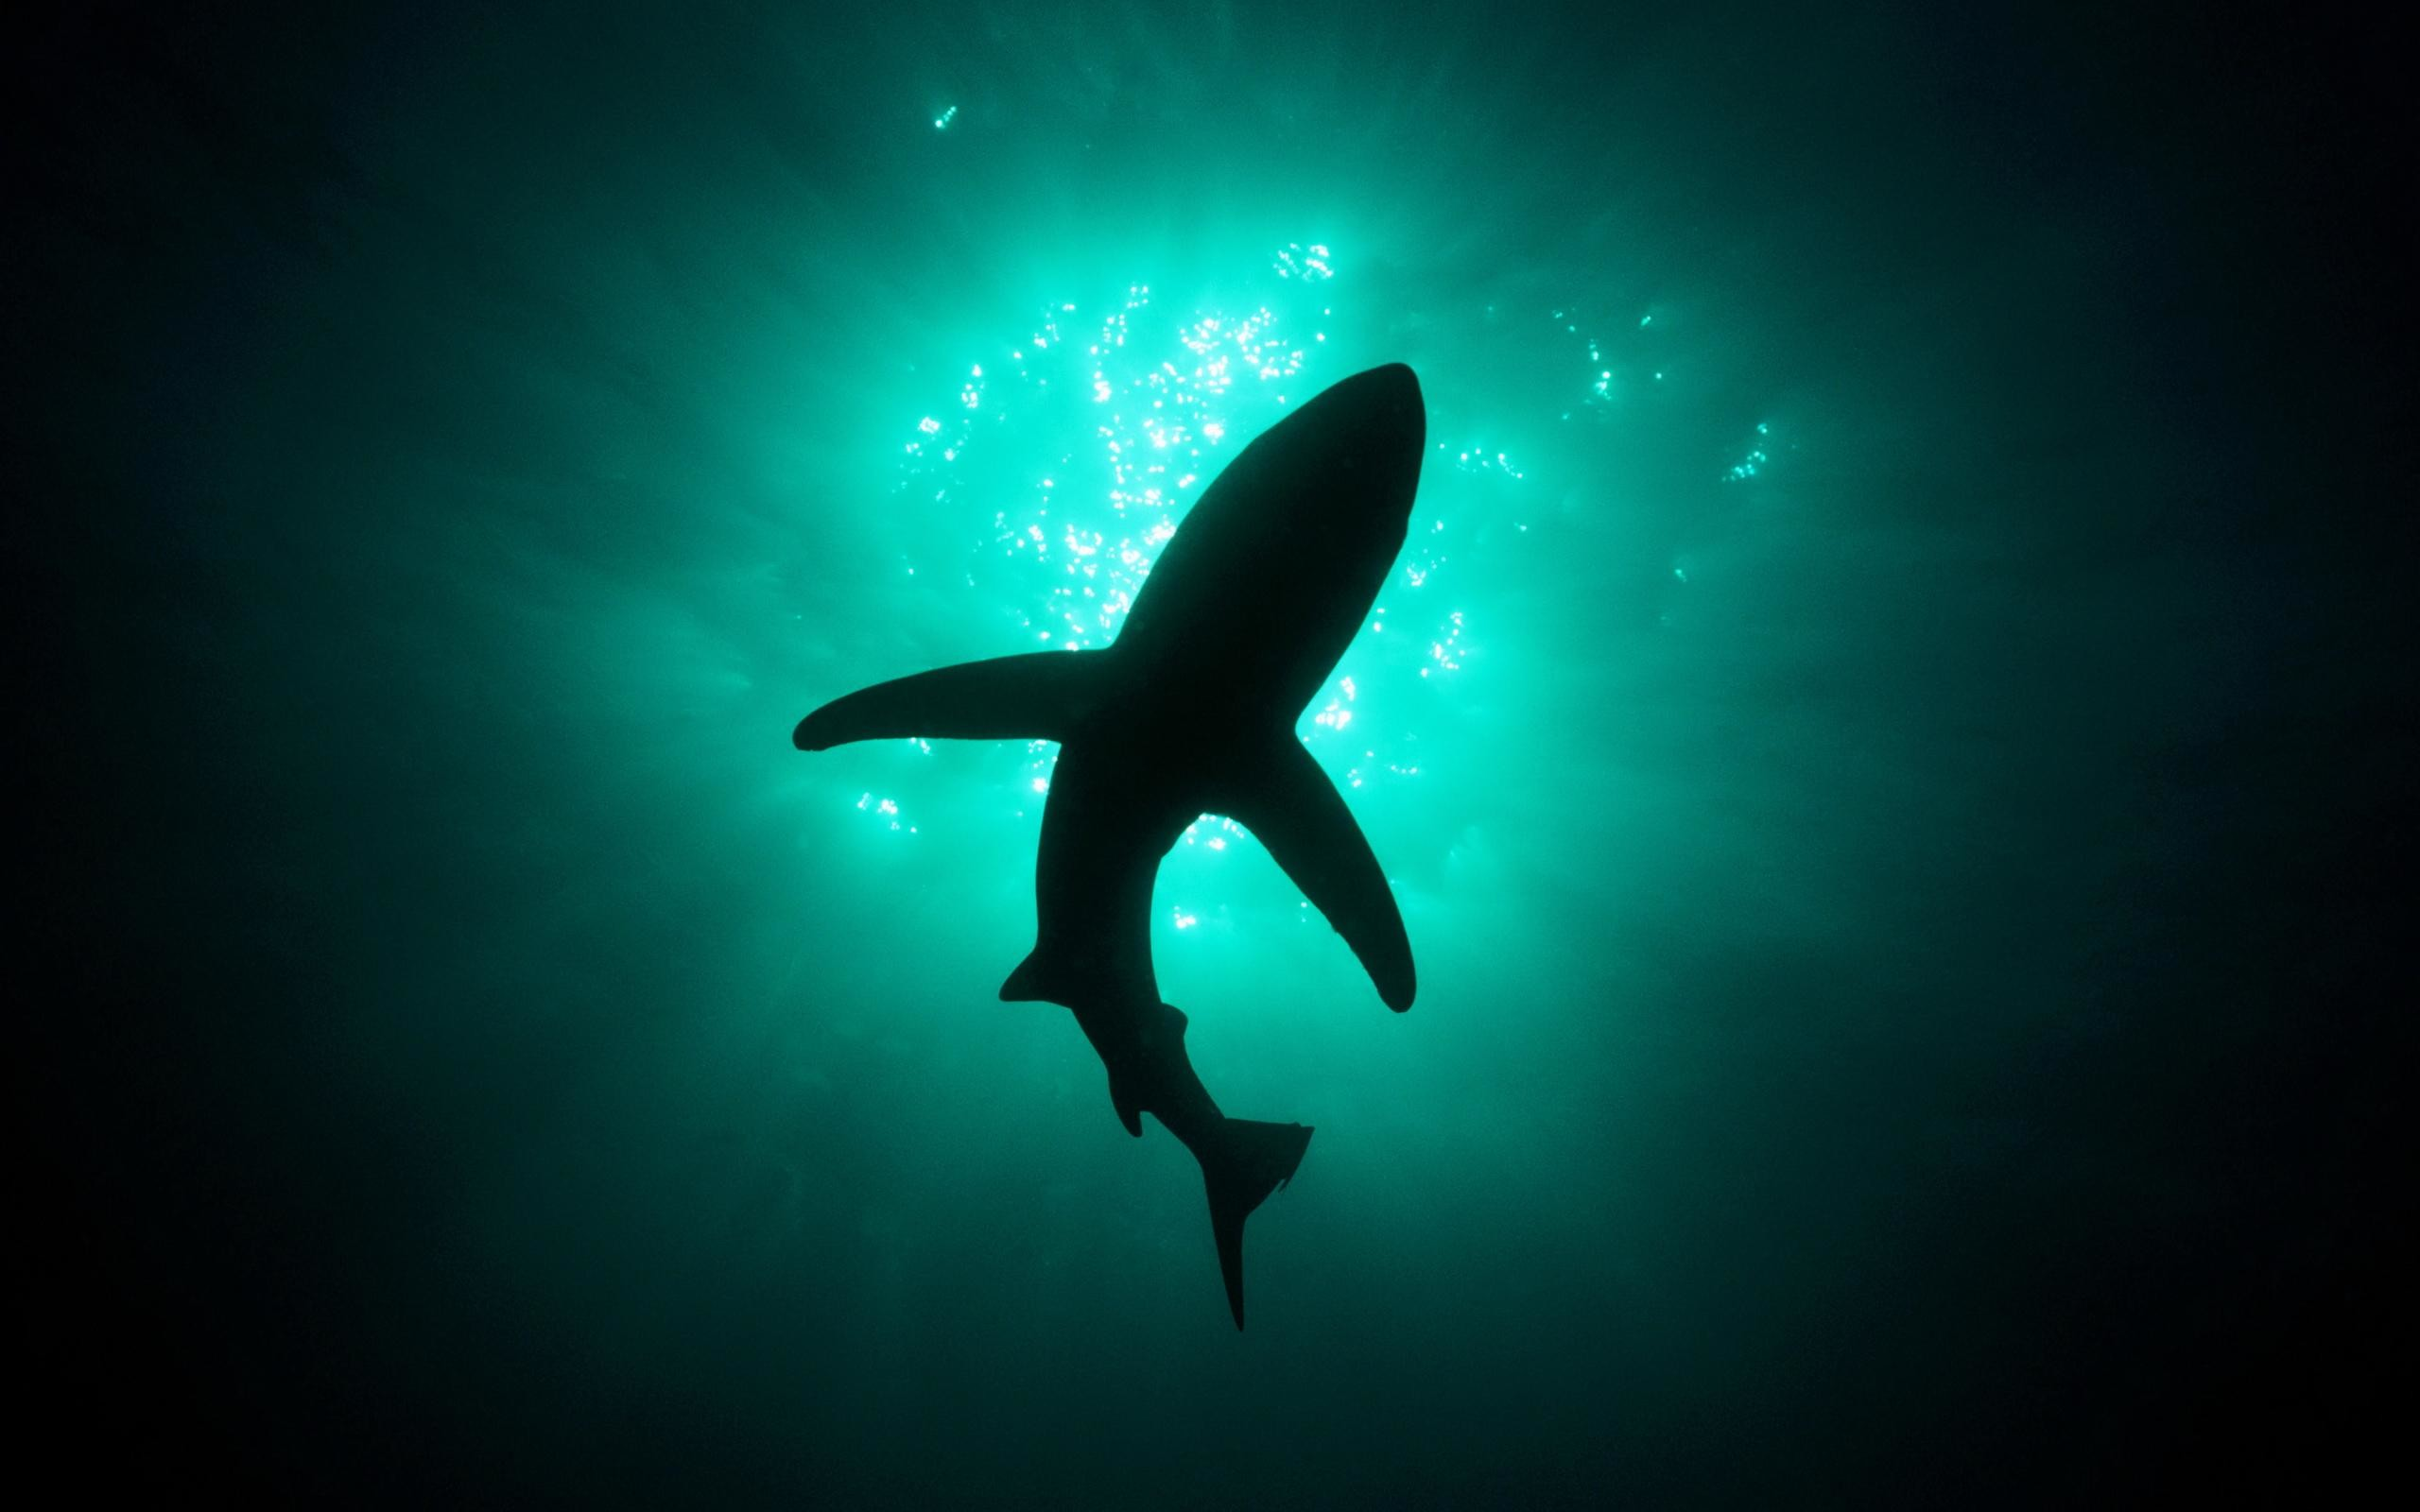 Hd-Shark-Wallpapers